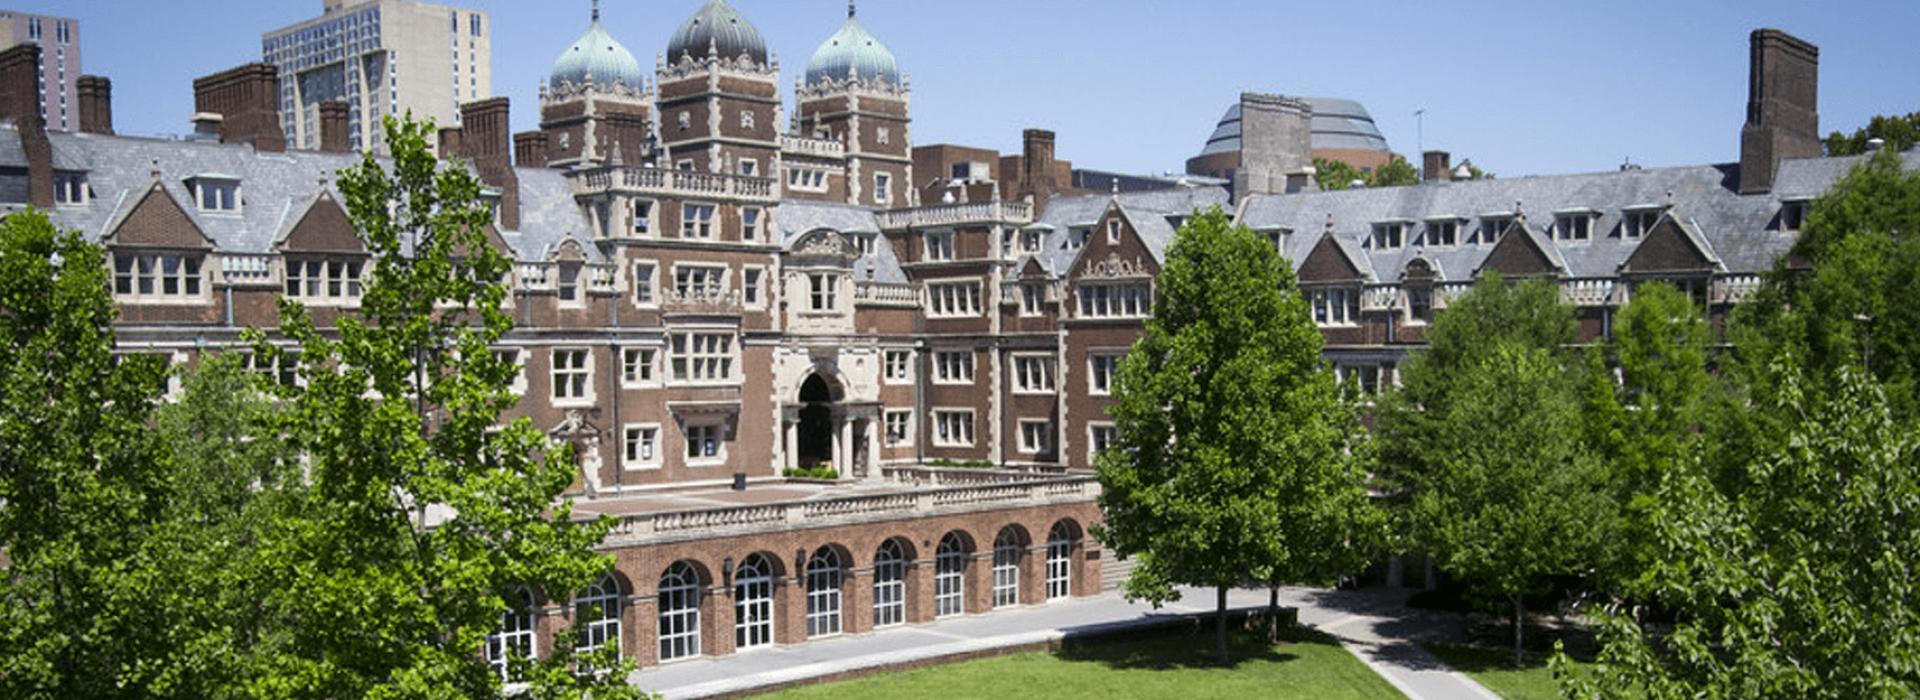 university-of-pennsylvania